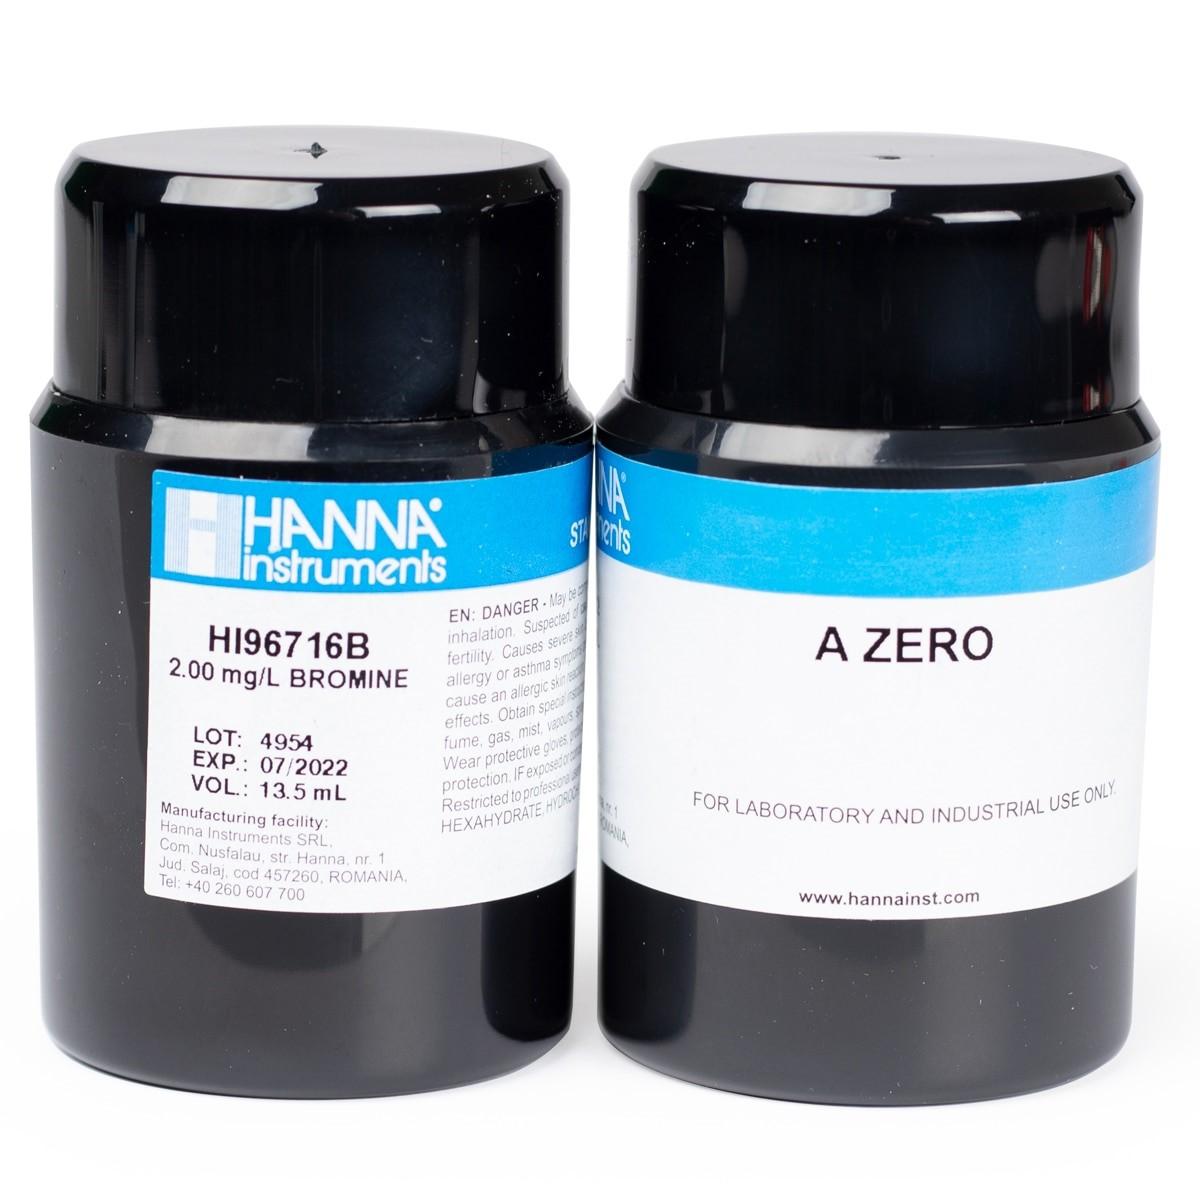 HI96716-11 Bromine CAL Check Standards